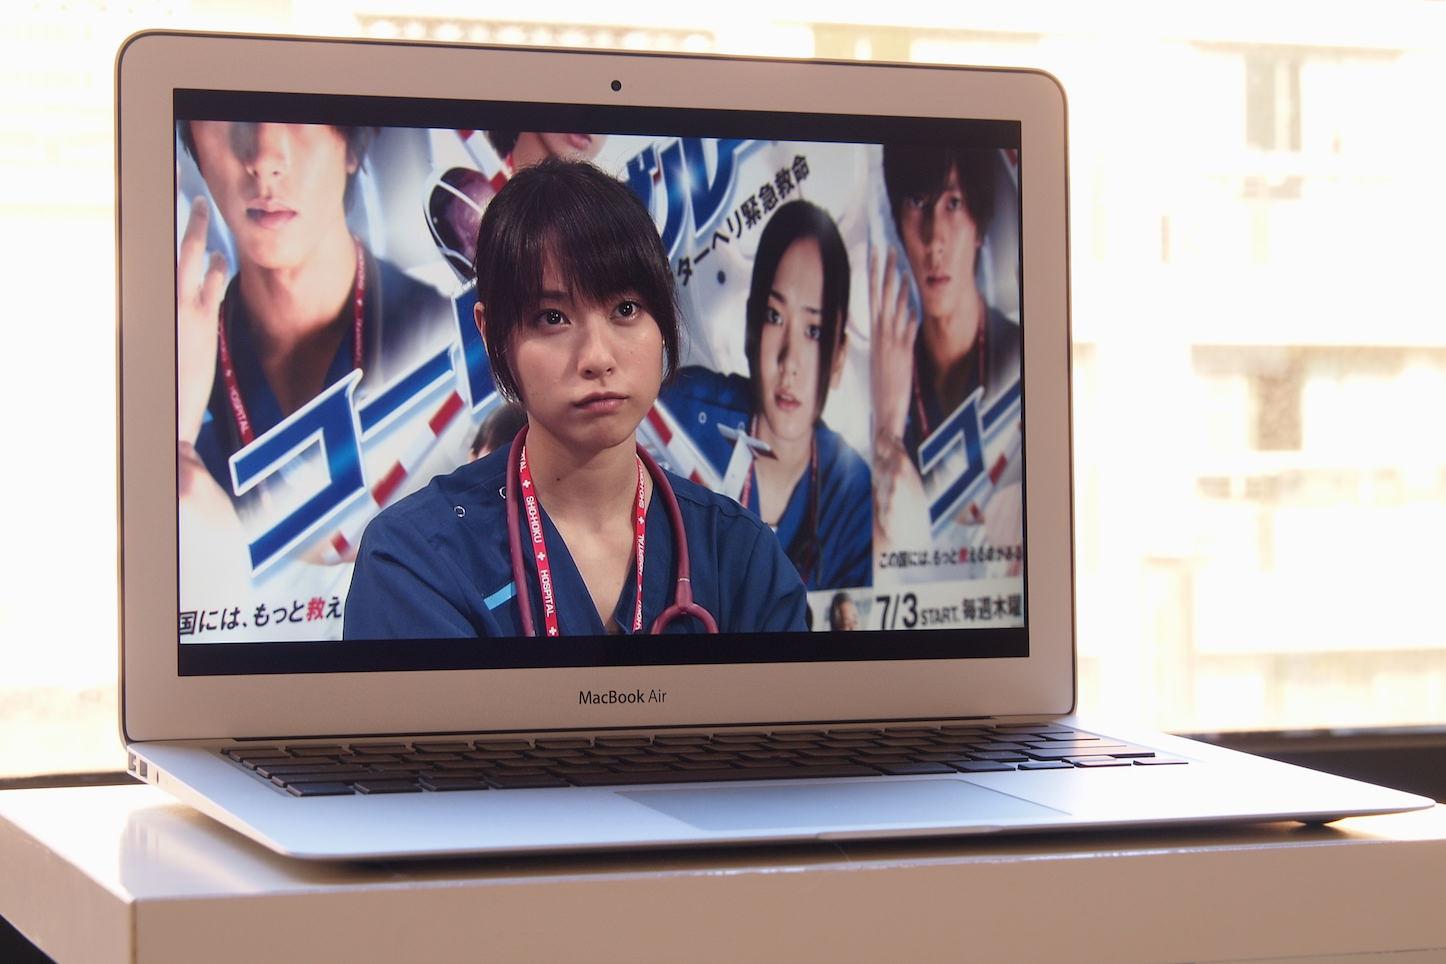 Macbook air 13inch 2010